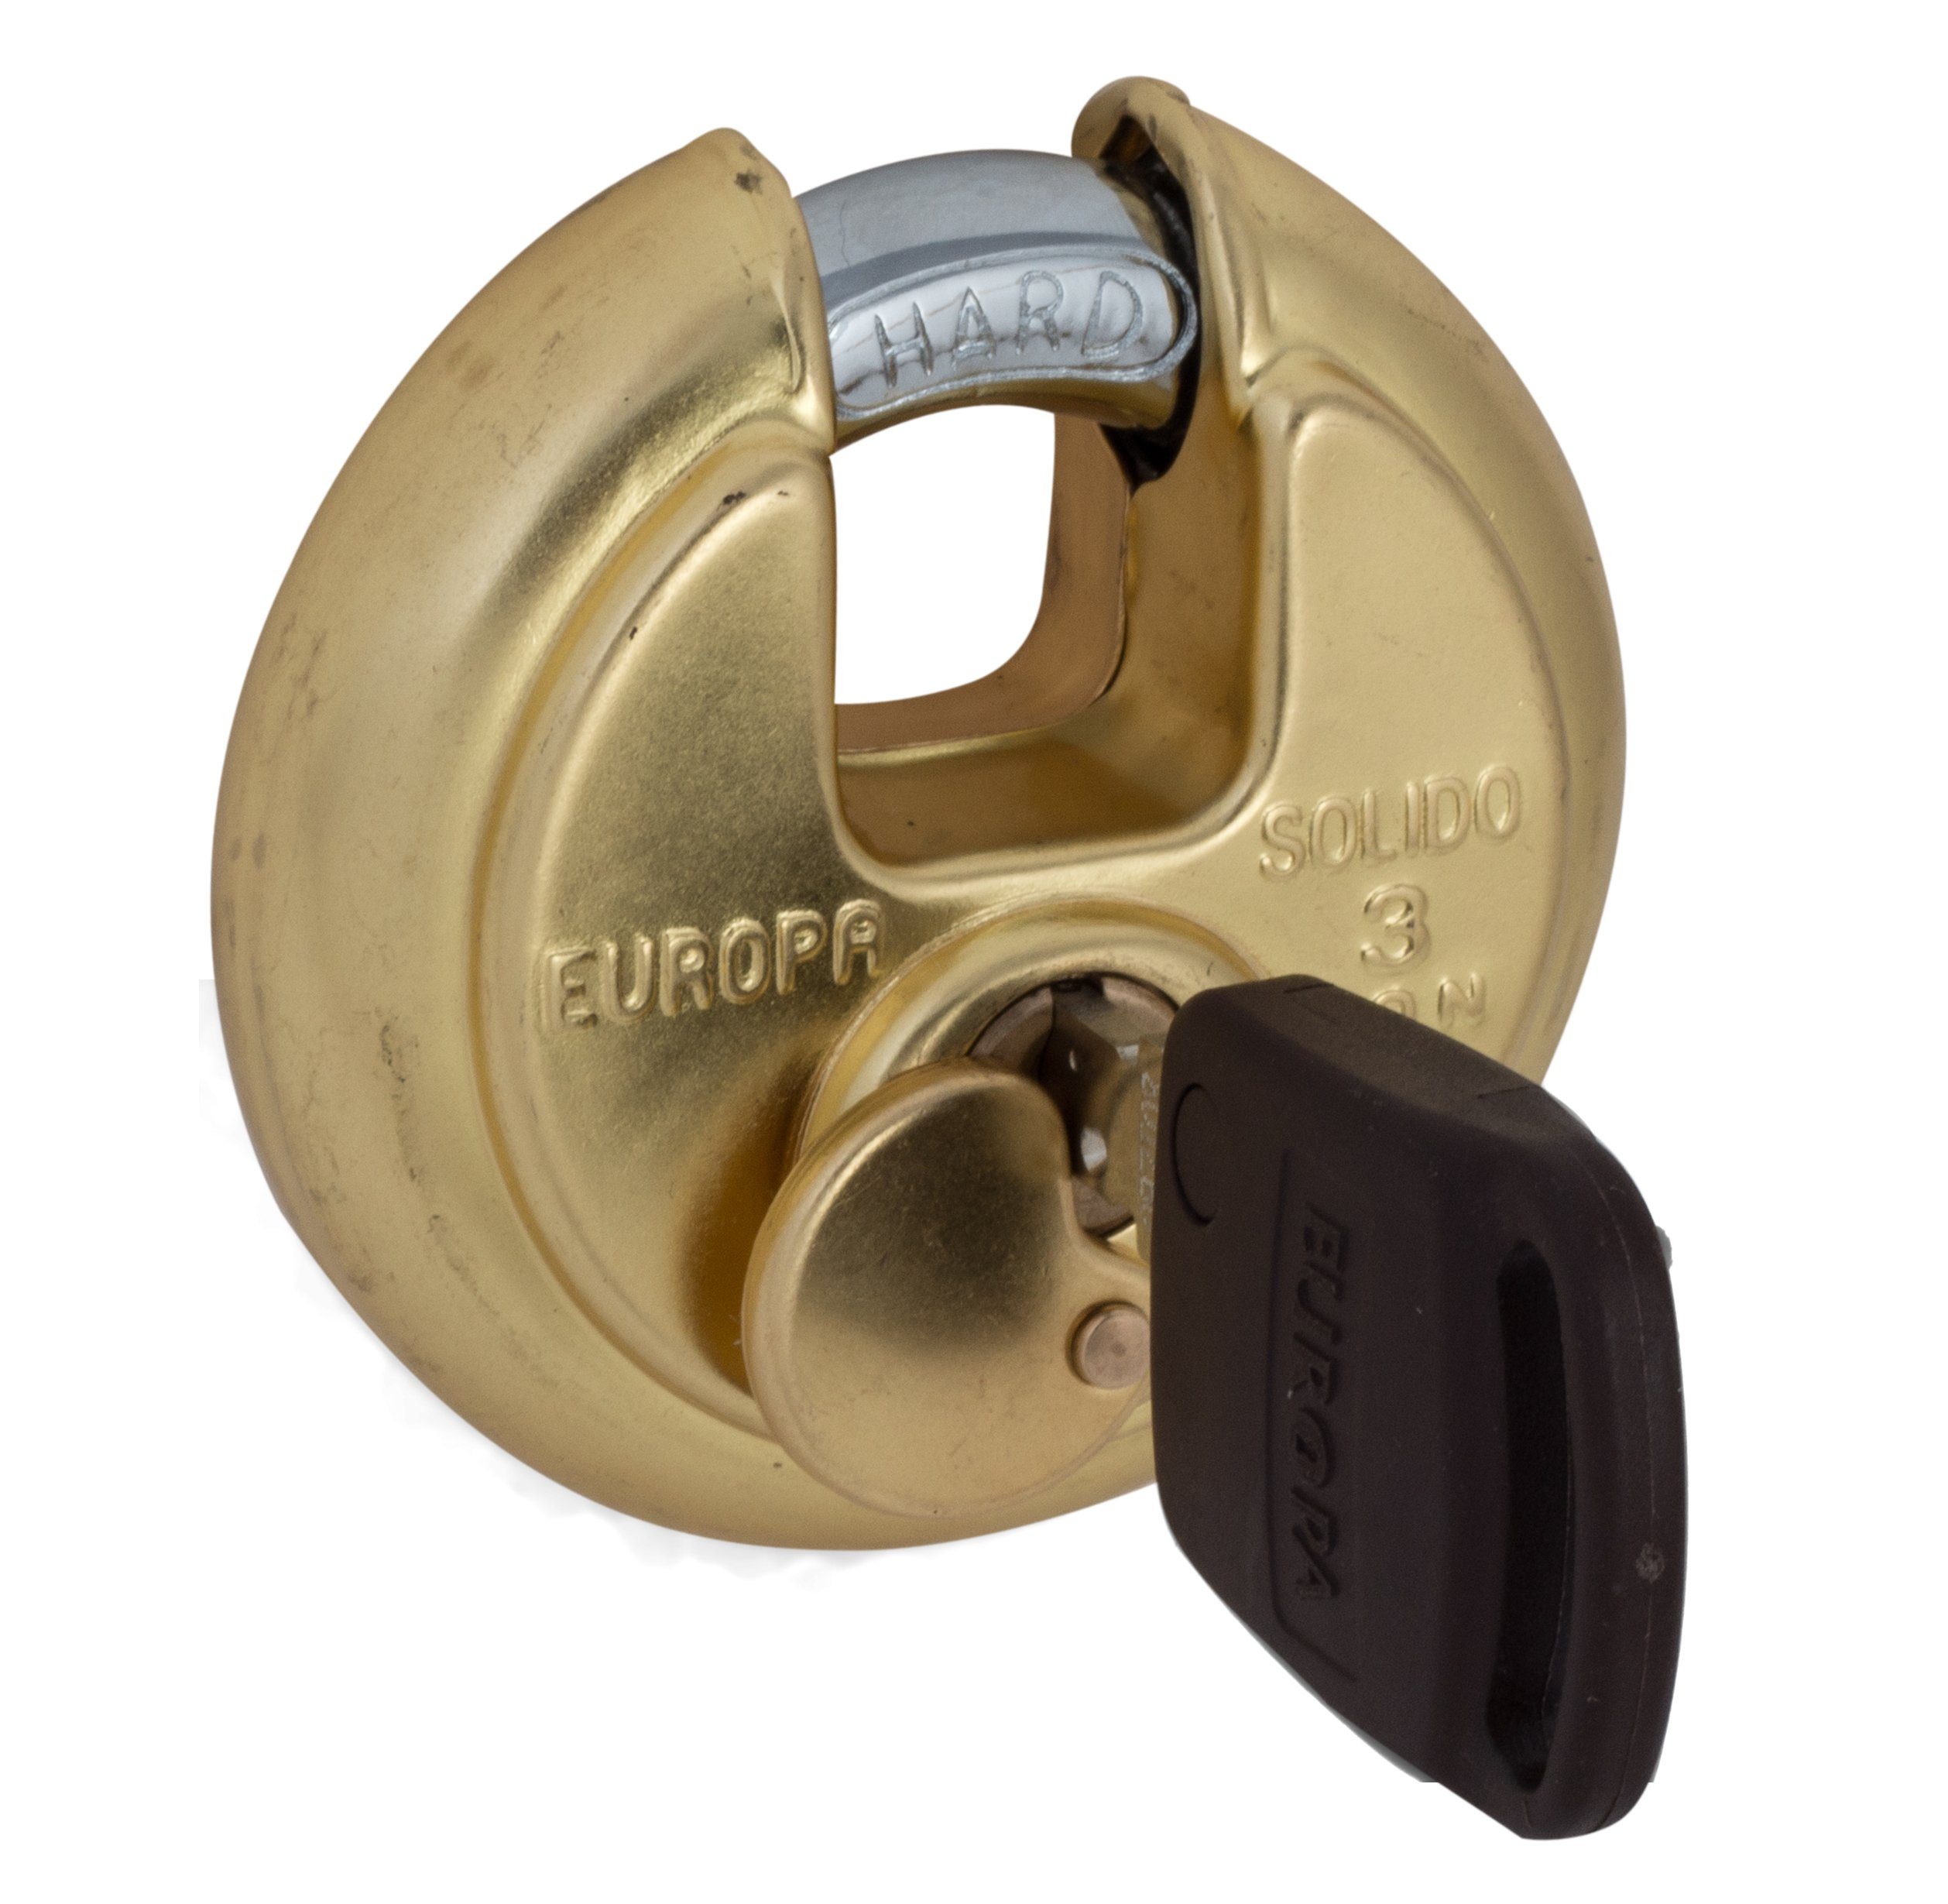 Europa P-370B1 TW Stainless Steel Disc Padlock (Golden)